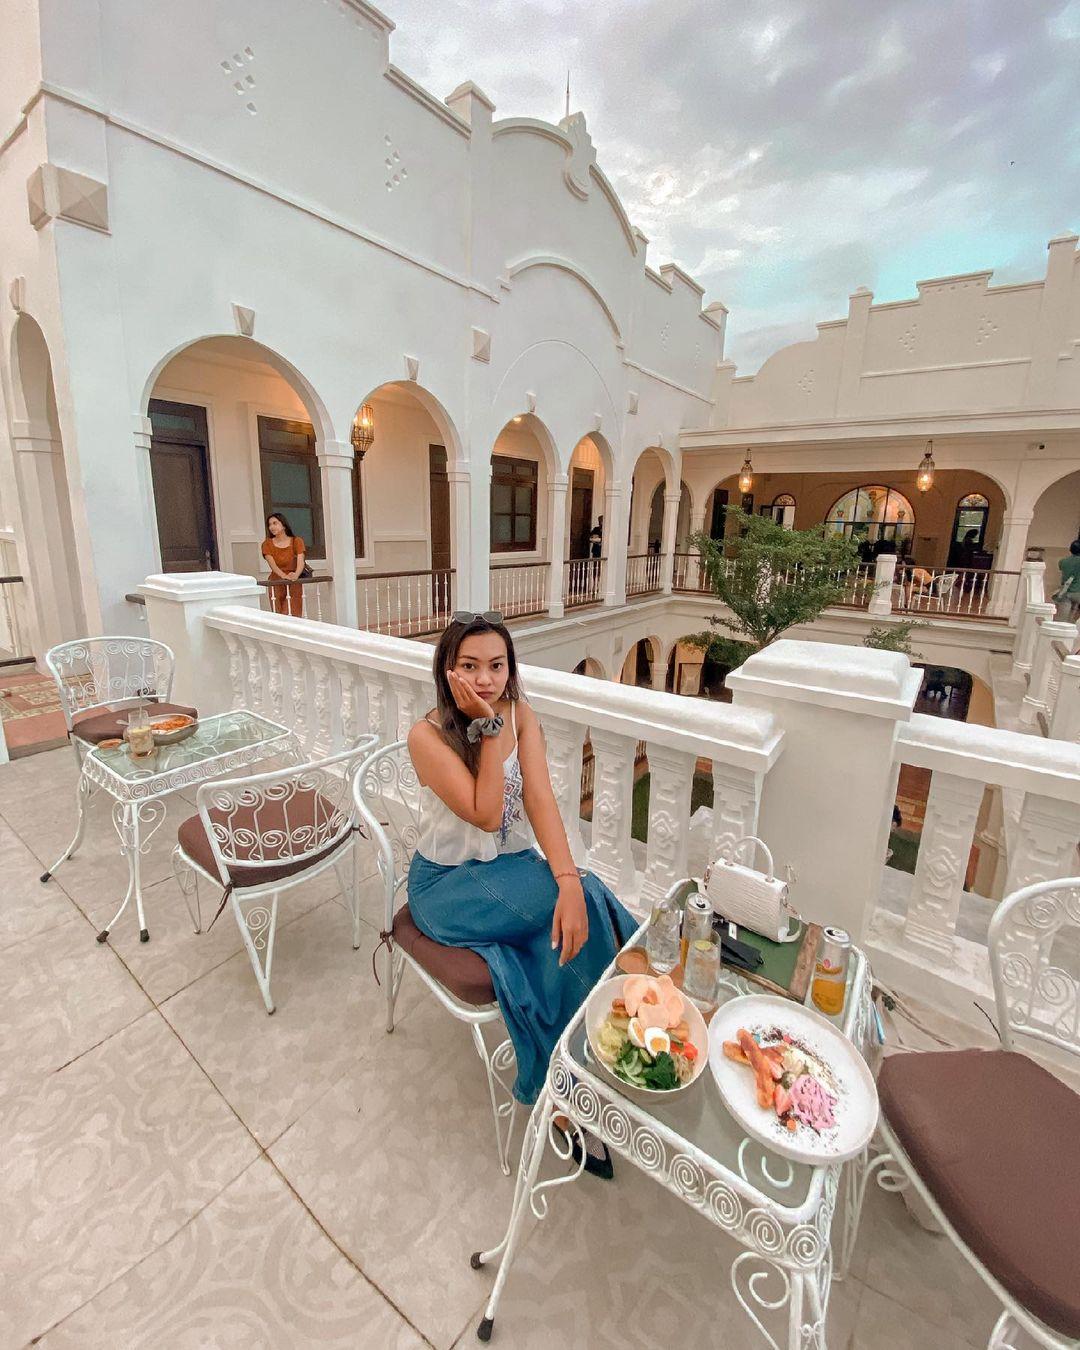 Menikmati Makanan Di Pitaloka Resto Bali Image From @dewiradityaa